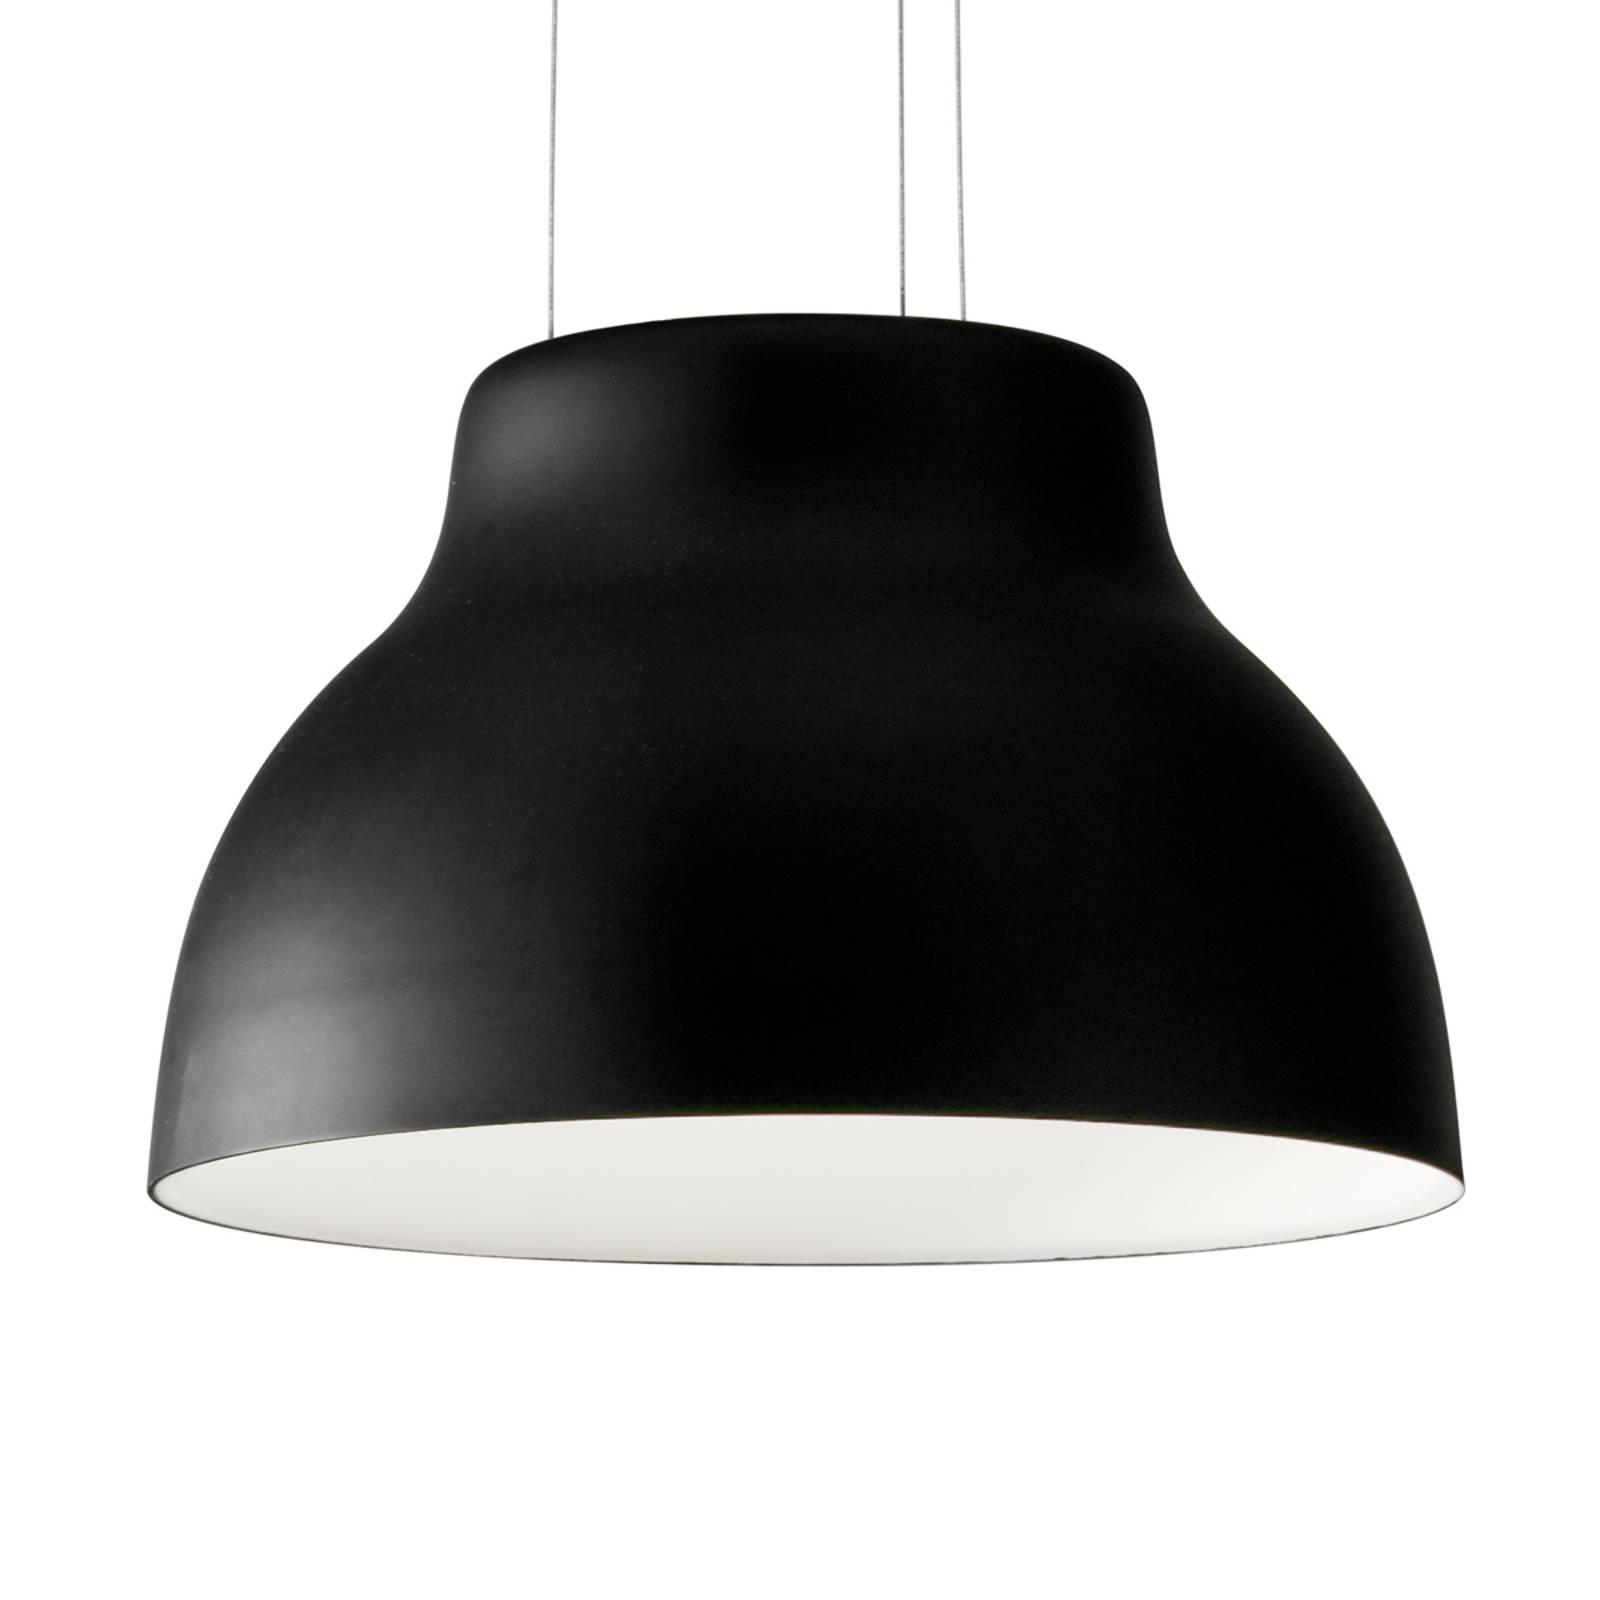 Martinelli Luce Cicala - lampa wisząca LED czarna